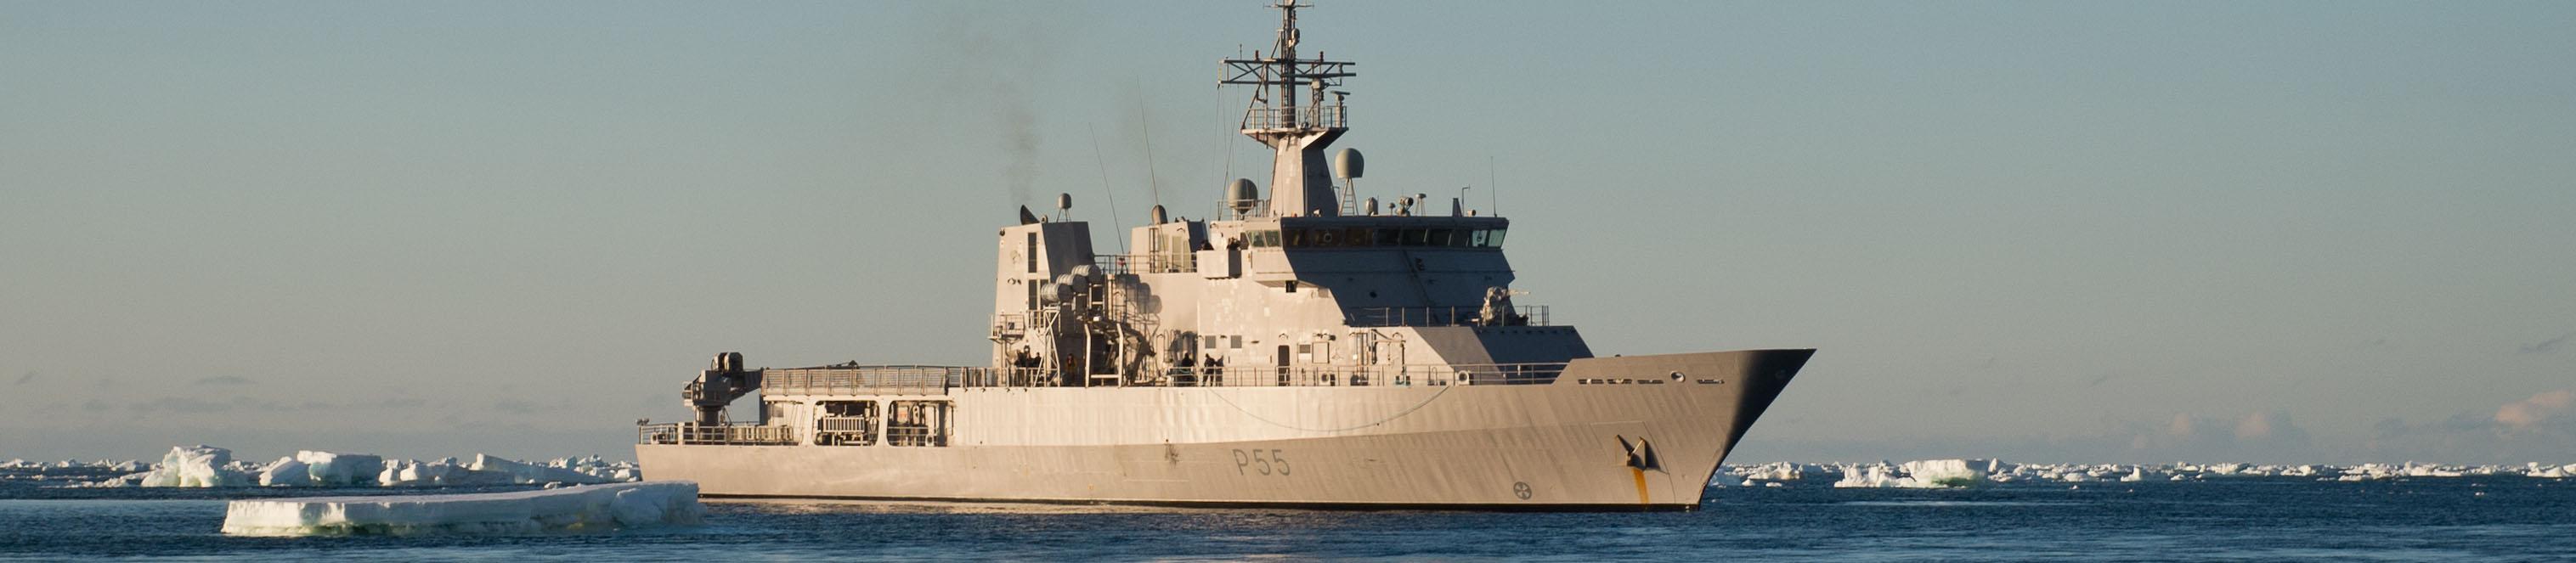 Navy-ship_2